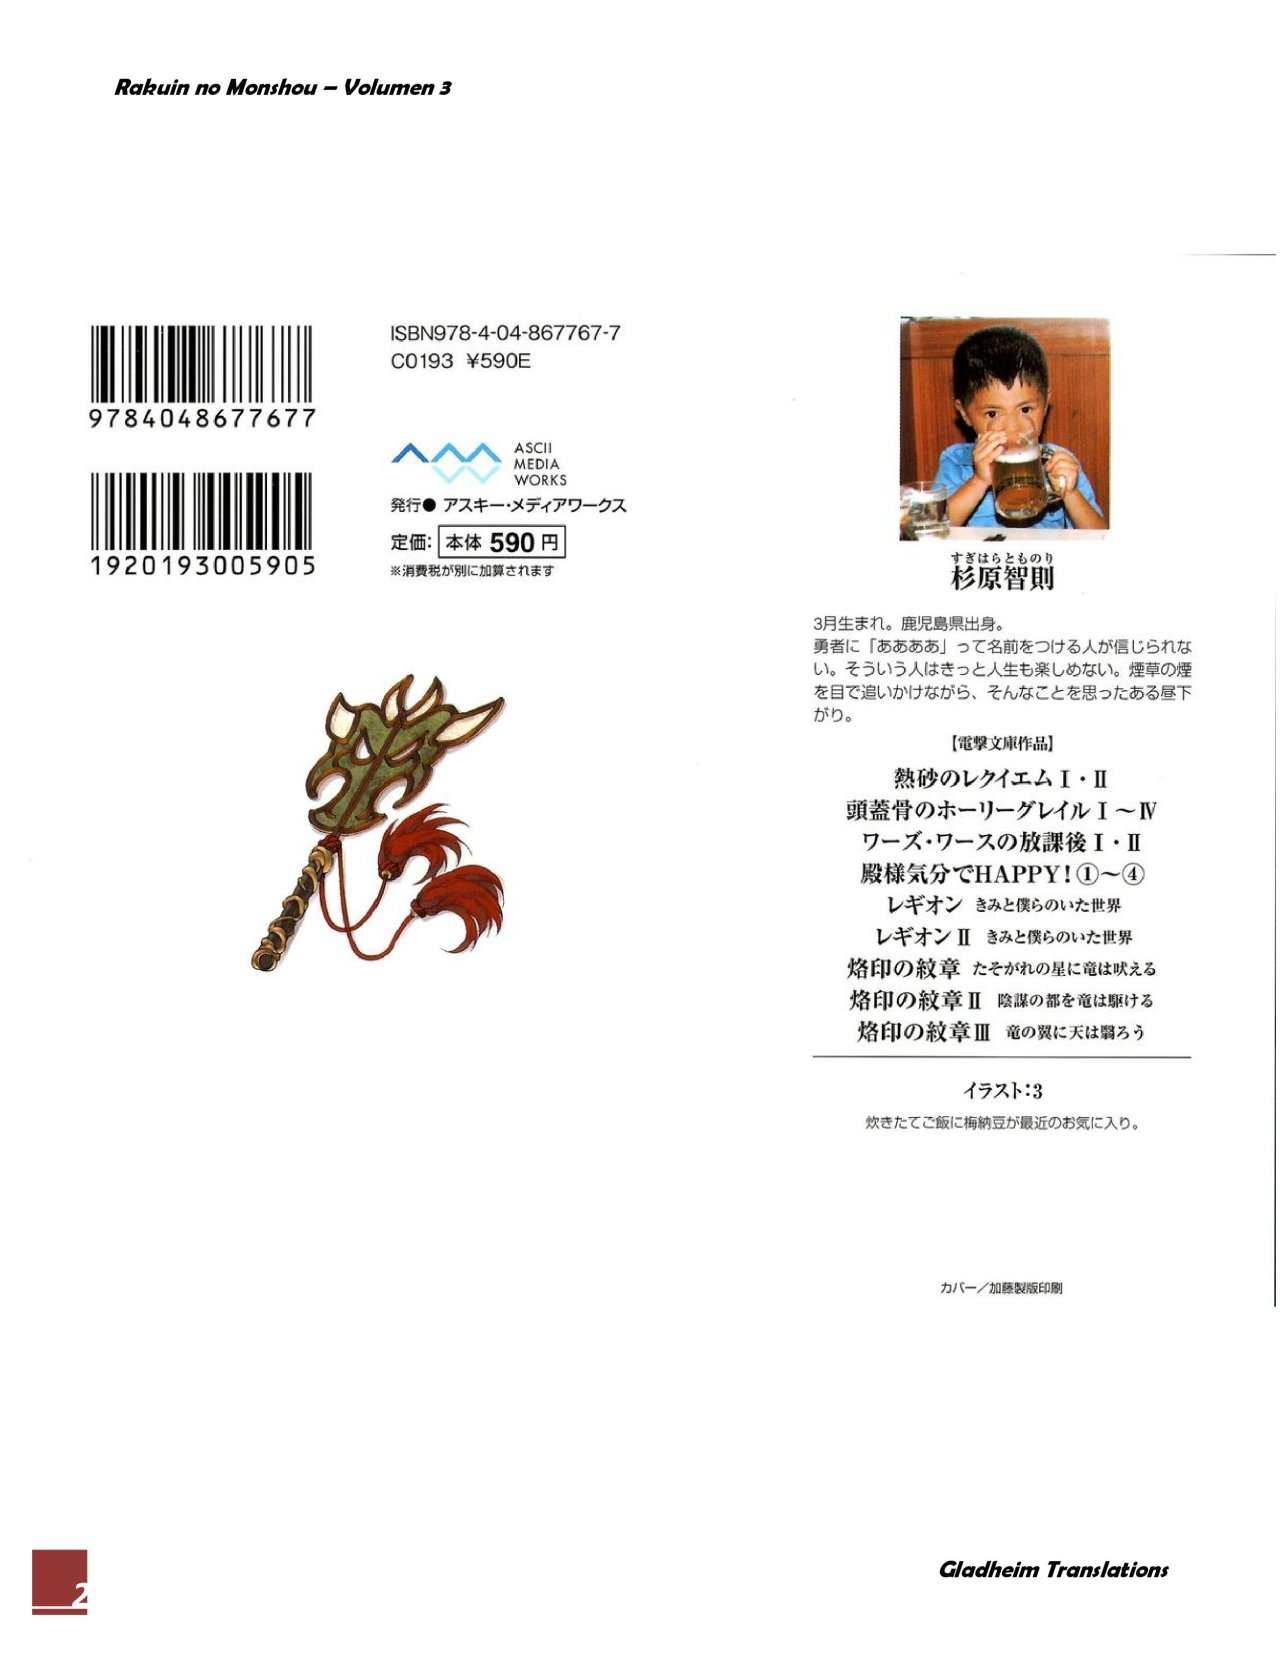 https://c9.mangatag.com/es_manga/pic5/22/25558/727844/a401a7204f2a3d6868f140085538747a.jpg Page 2